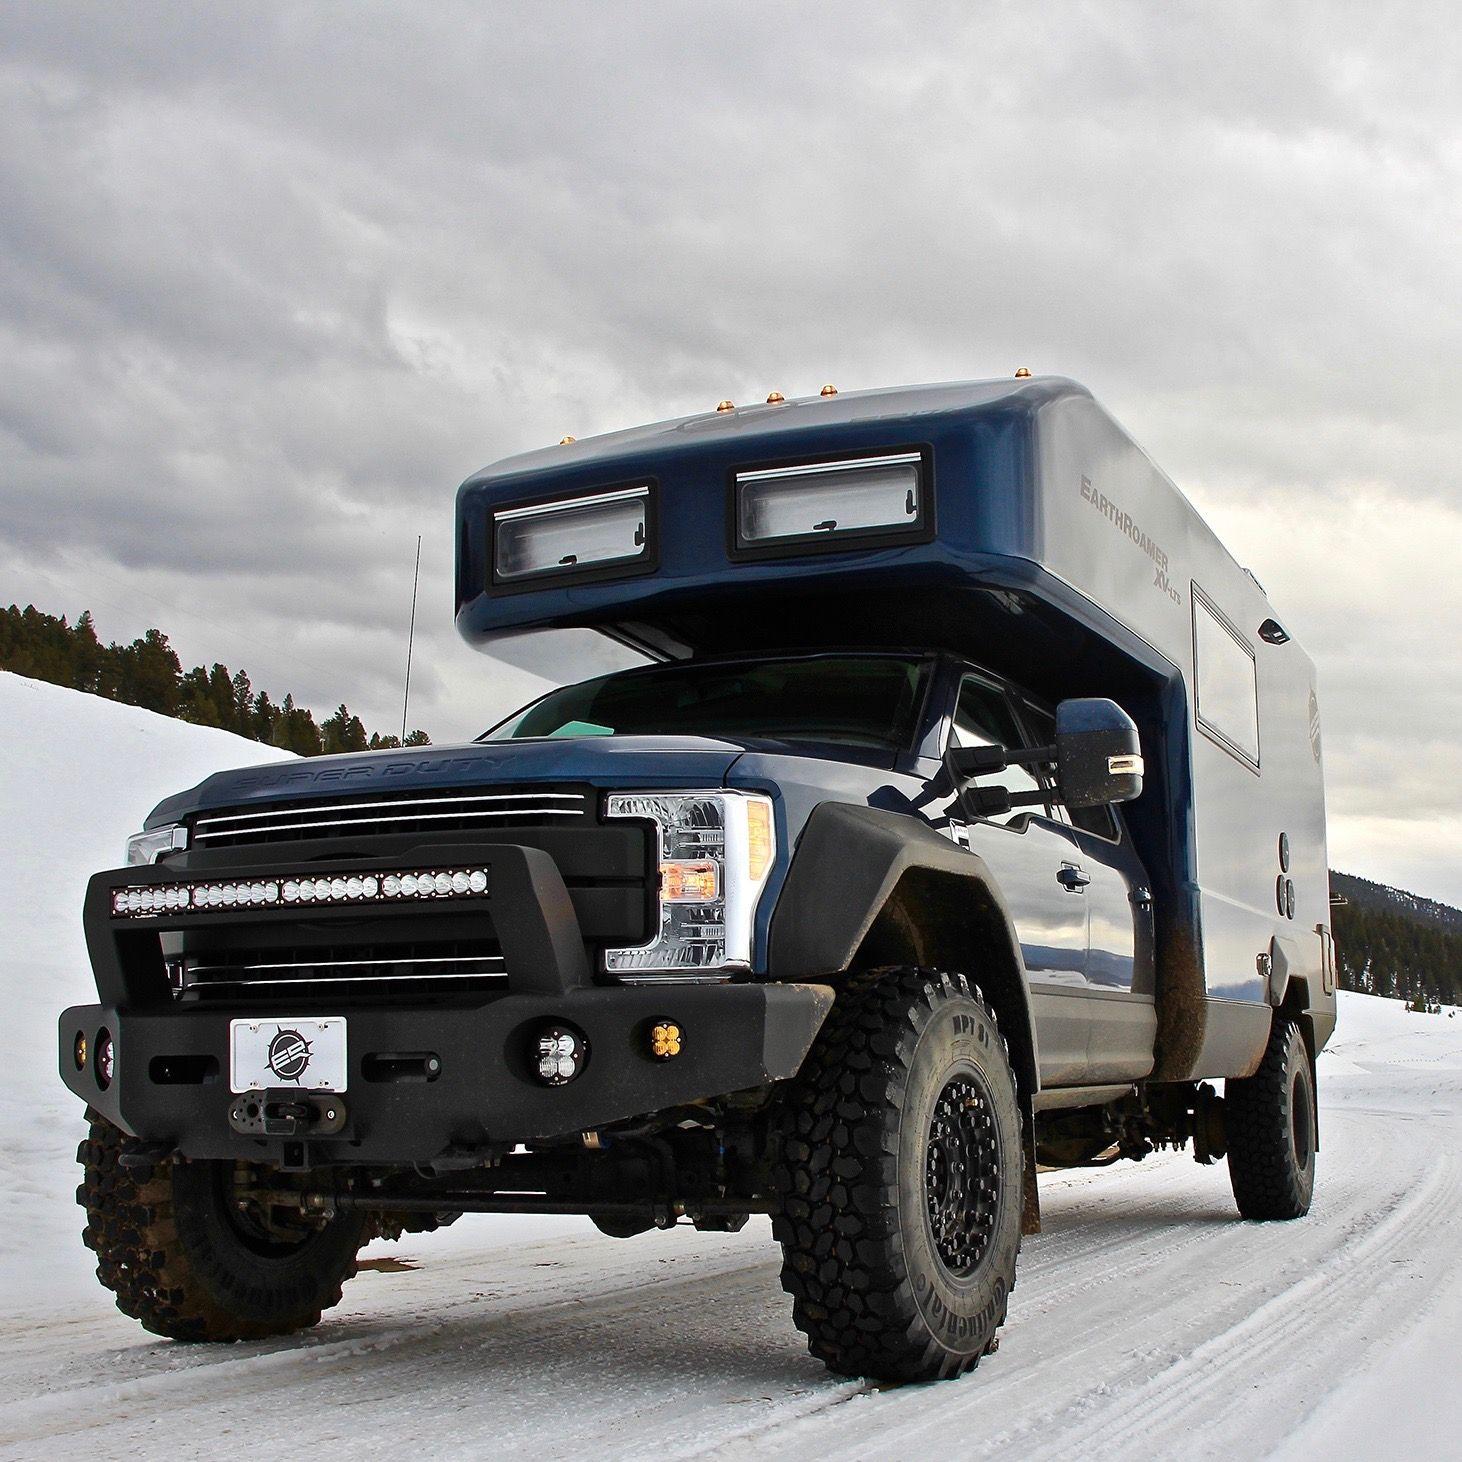 Earthroamer Jeep Unlimited - Year of Clean Water